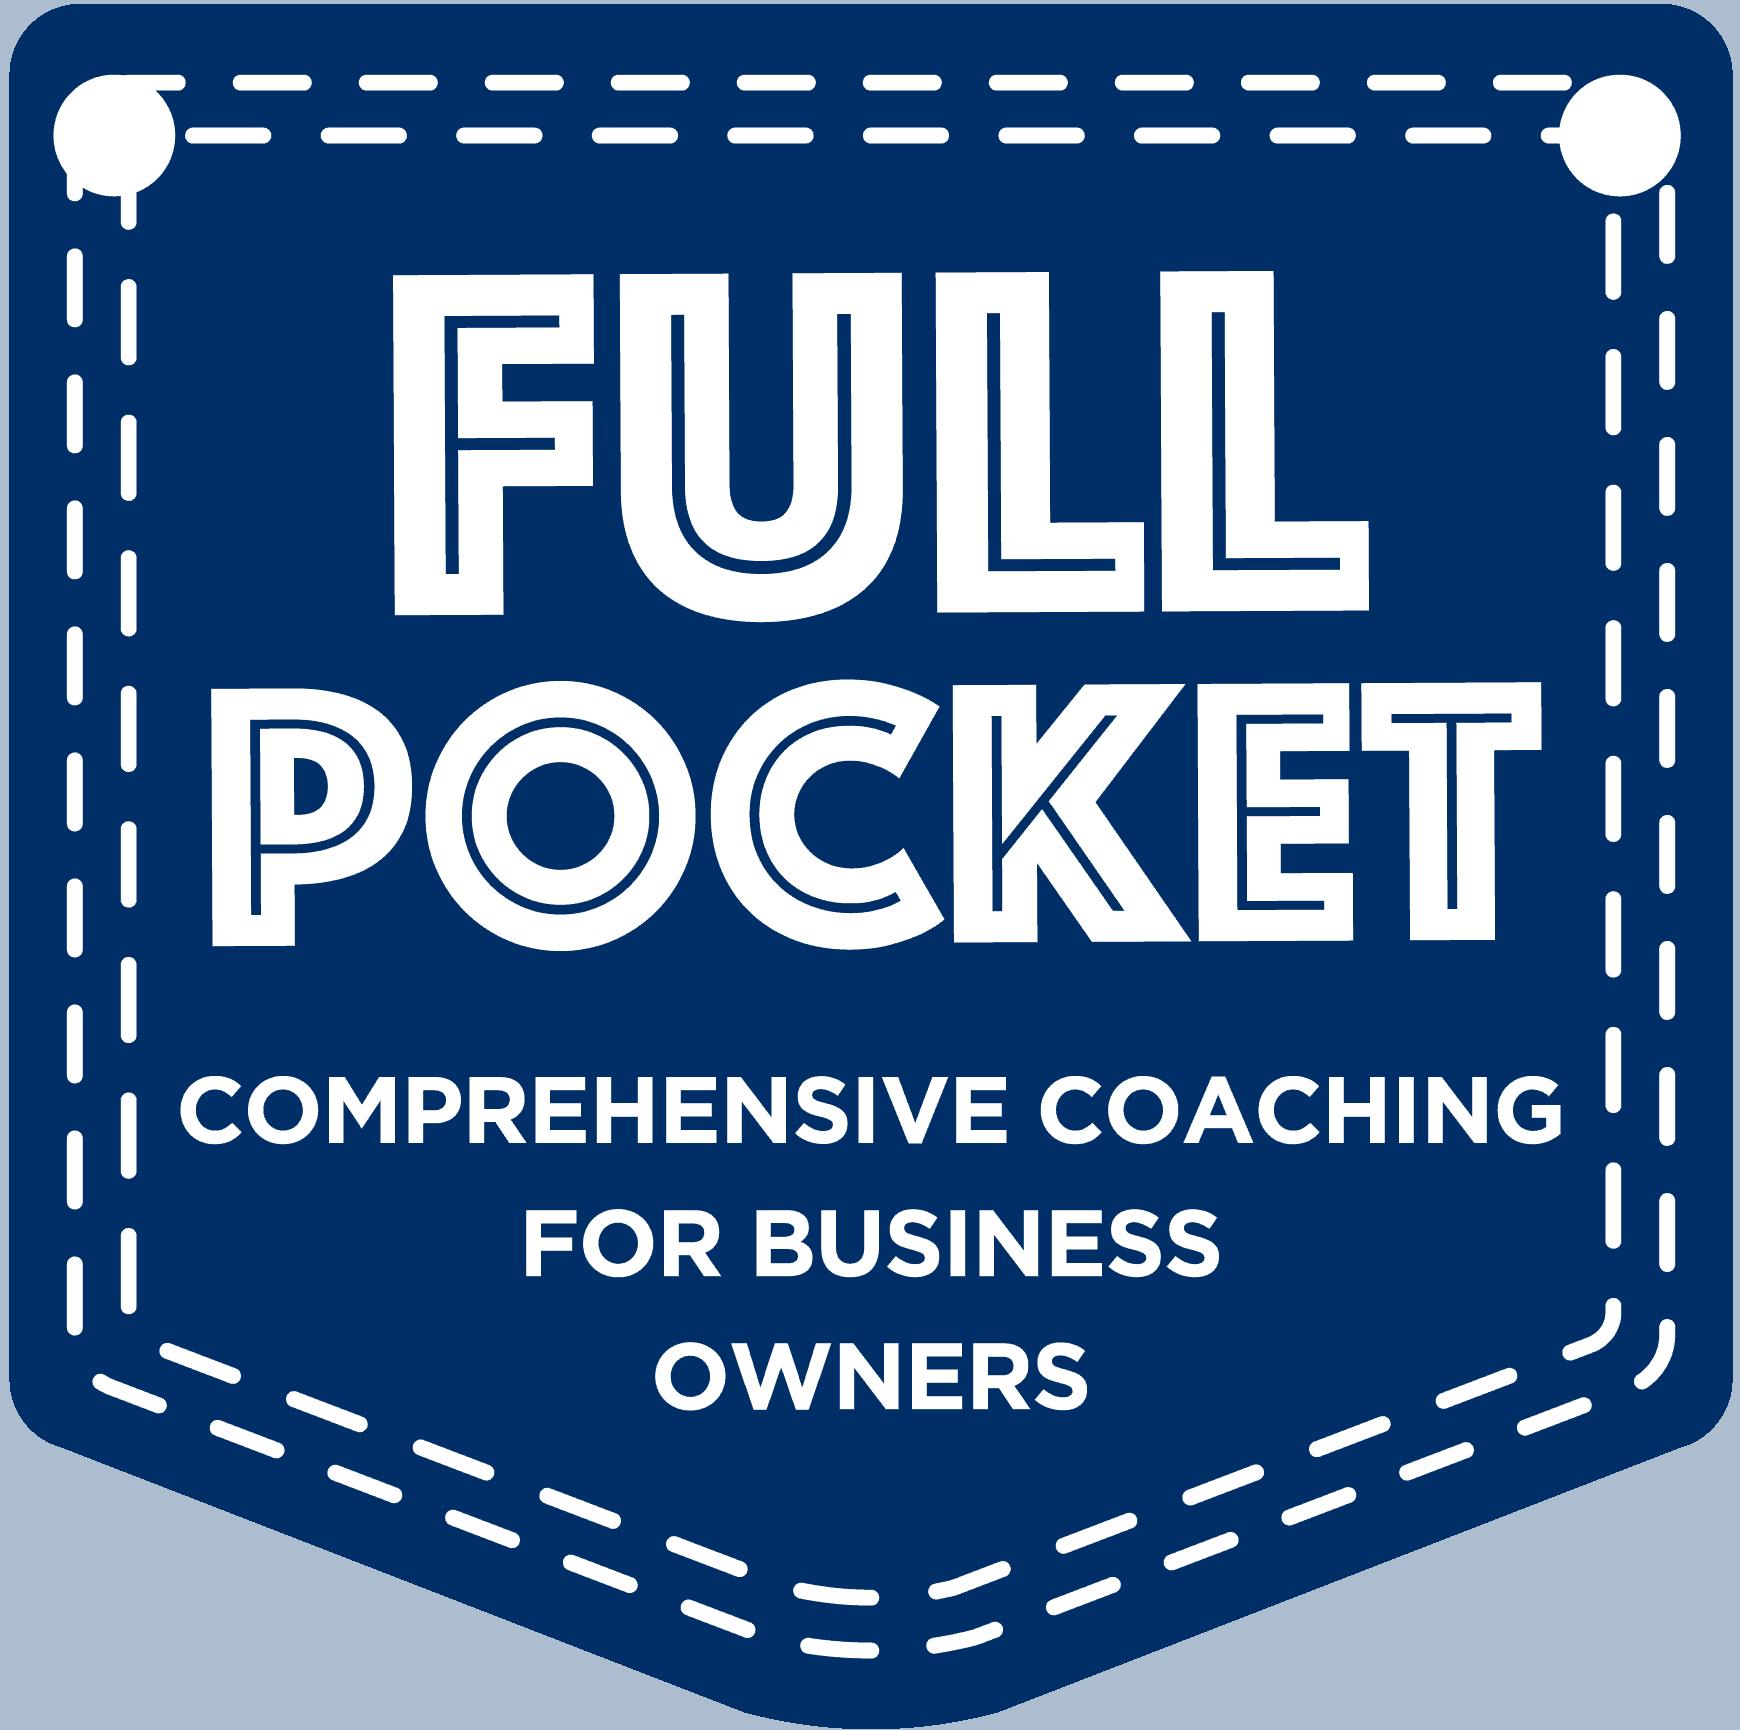 Full Pocket Coaching